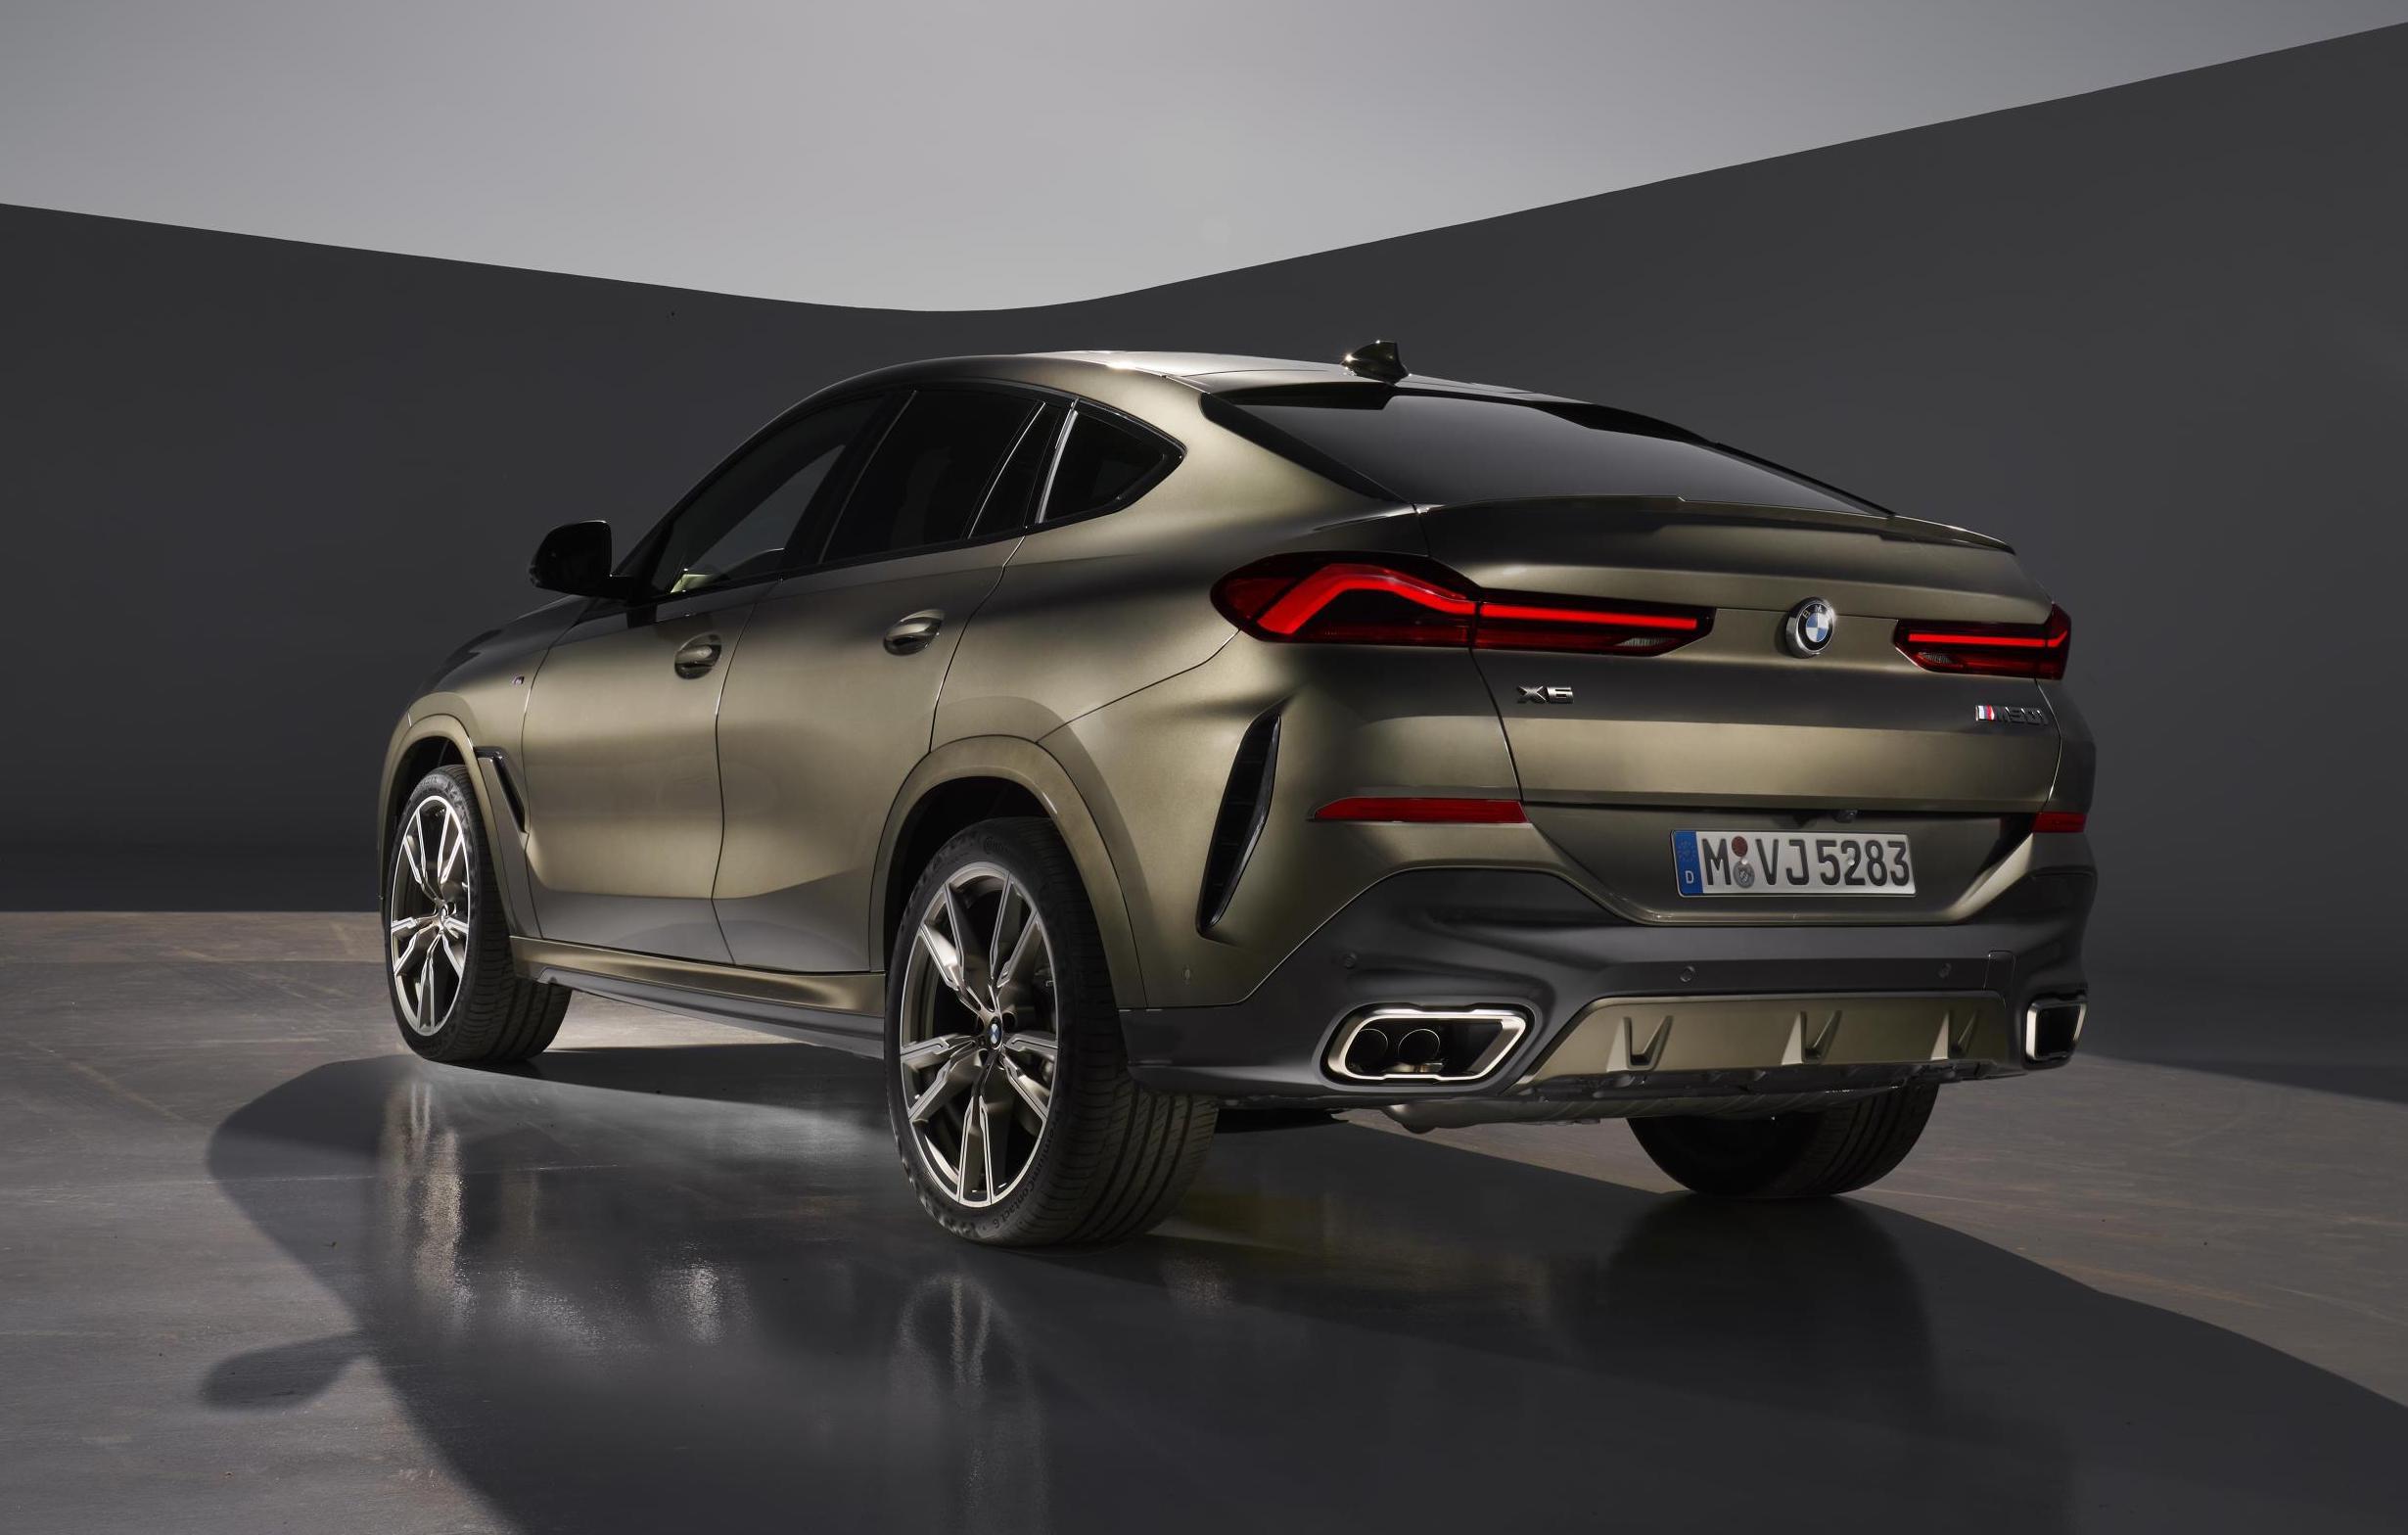 2020 Bmw X6 Revealed Topped By M50i Performancedrive